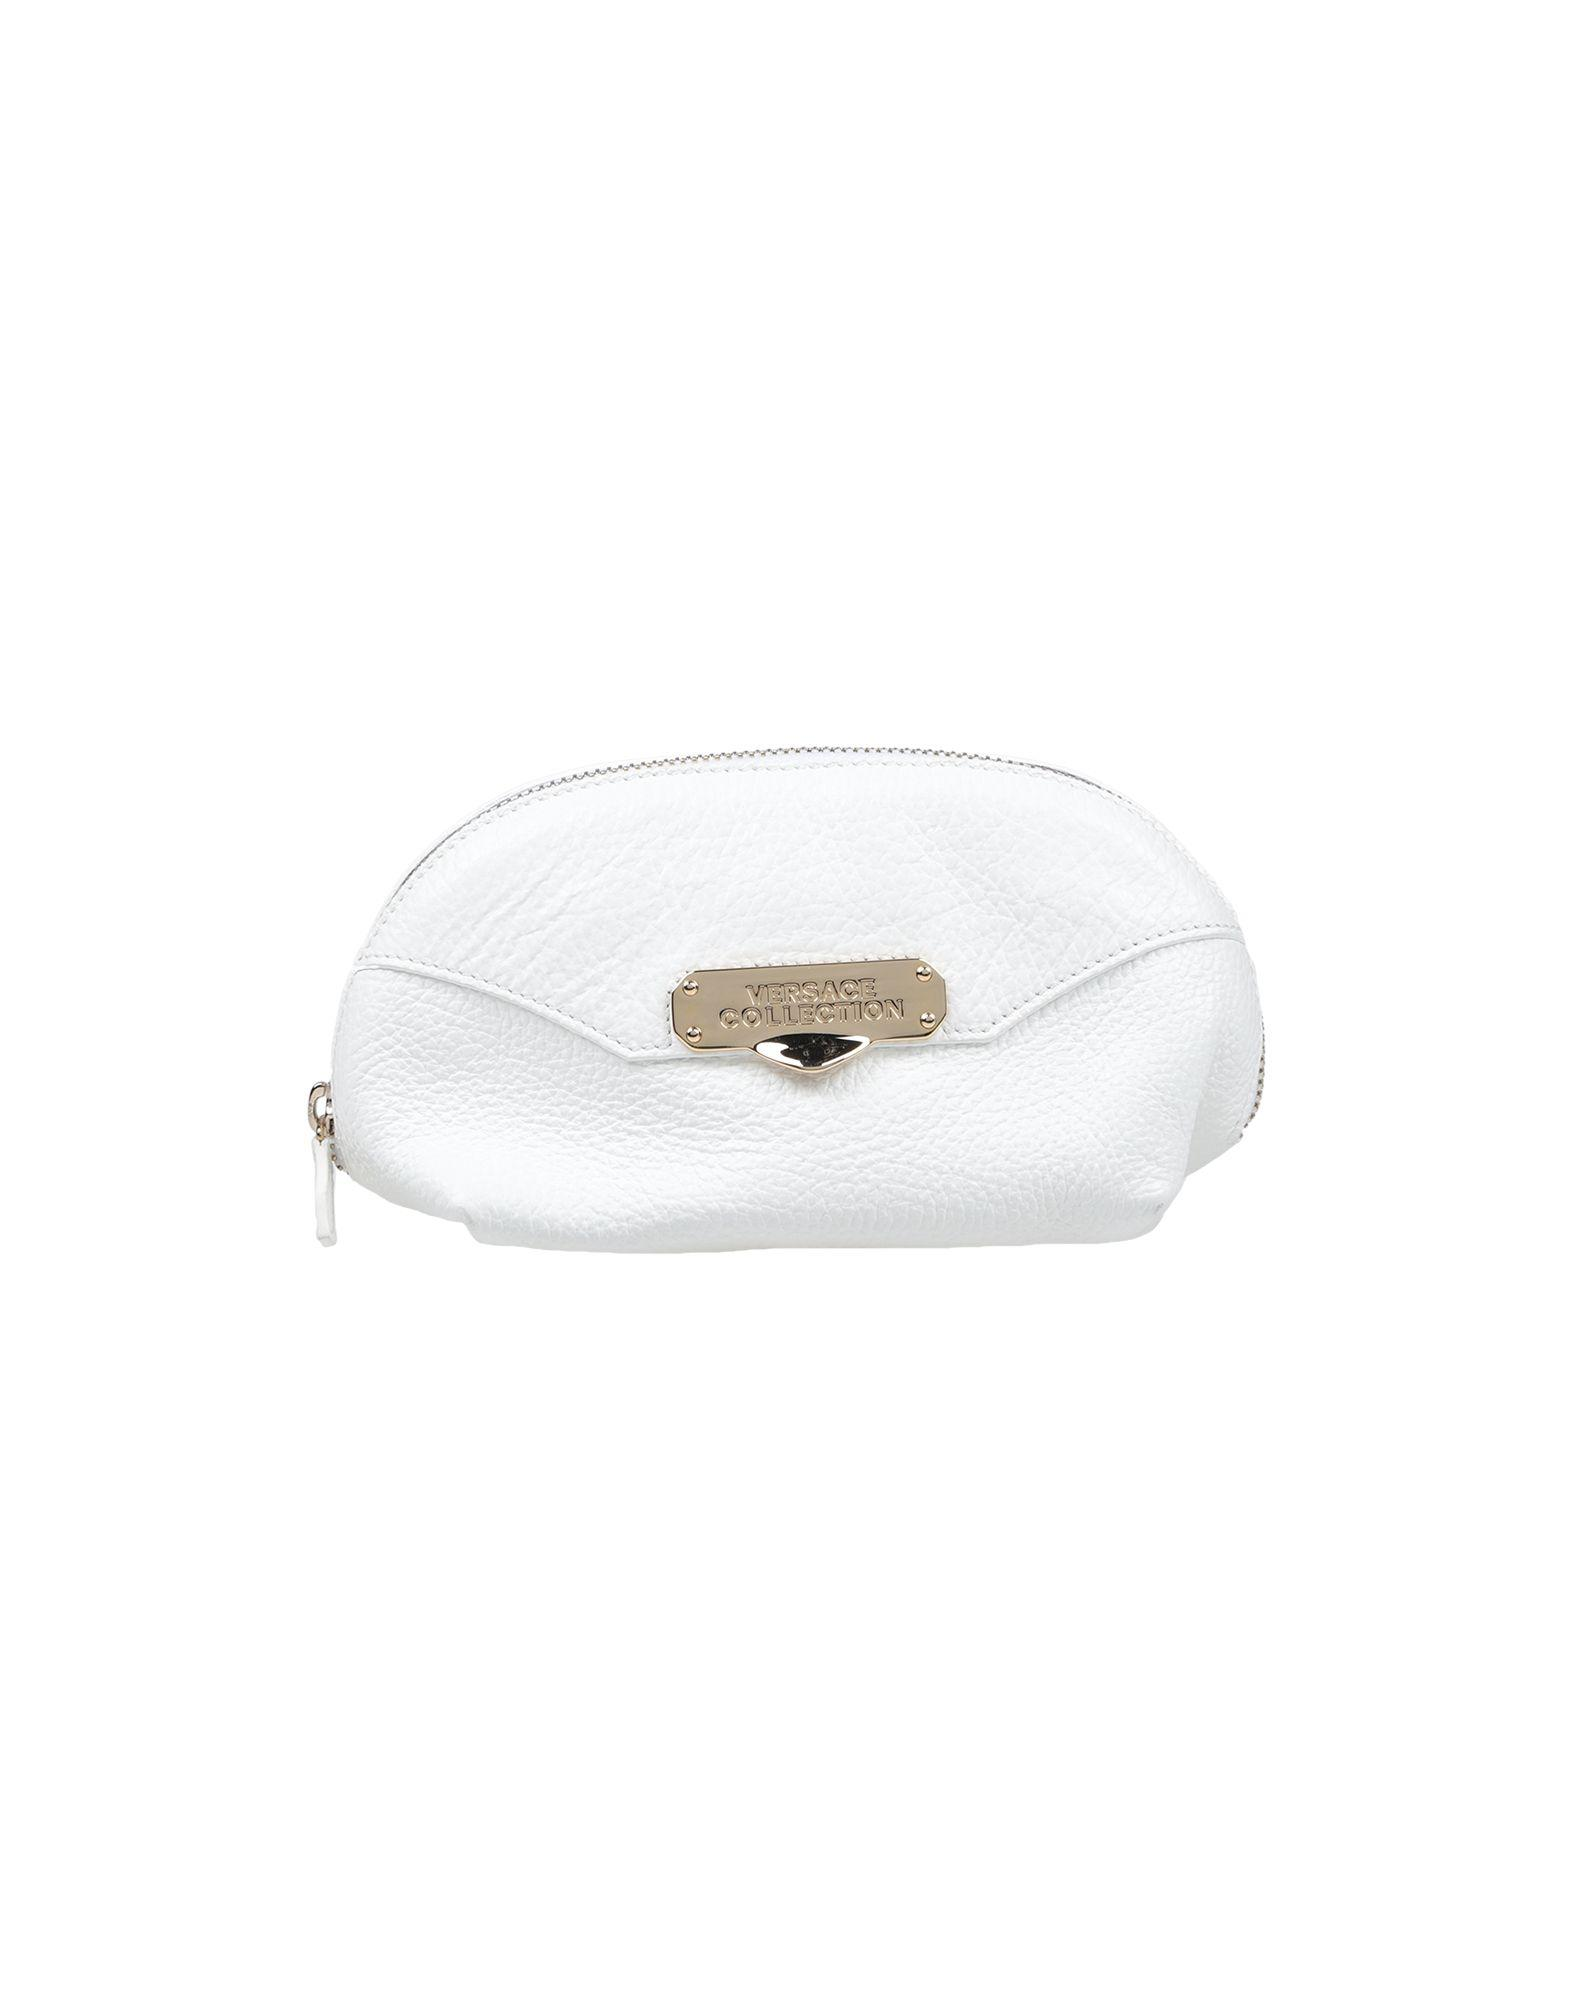 0765ed3d05da Lyst - Versace Pouch in White